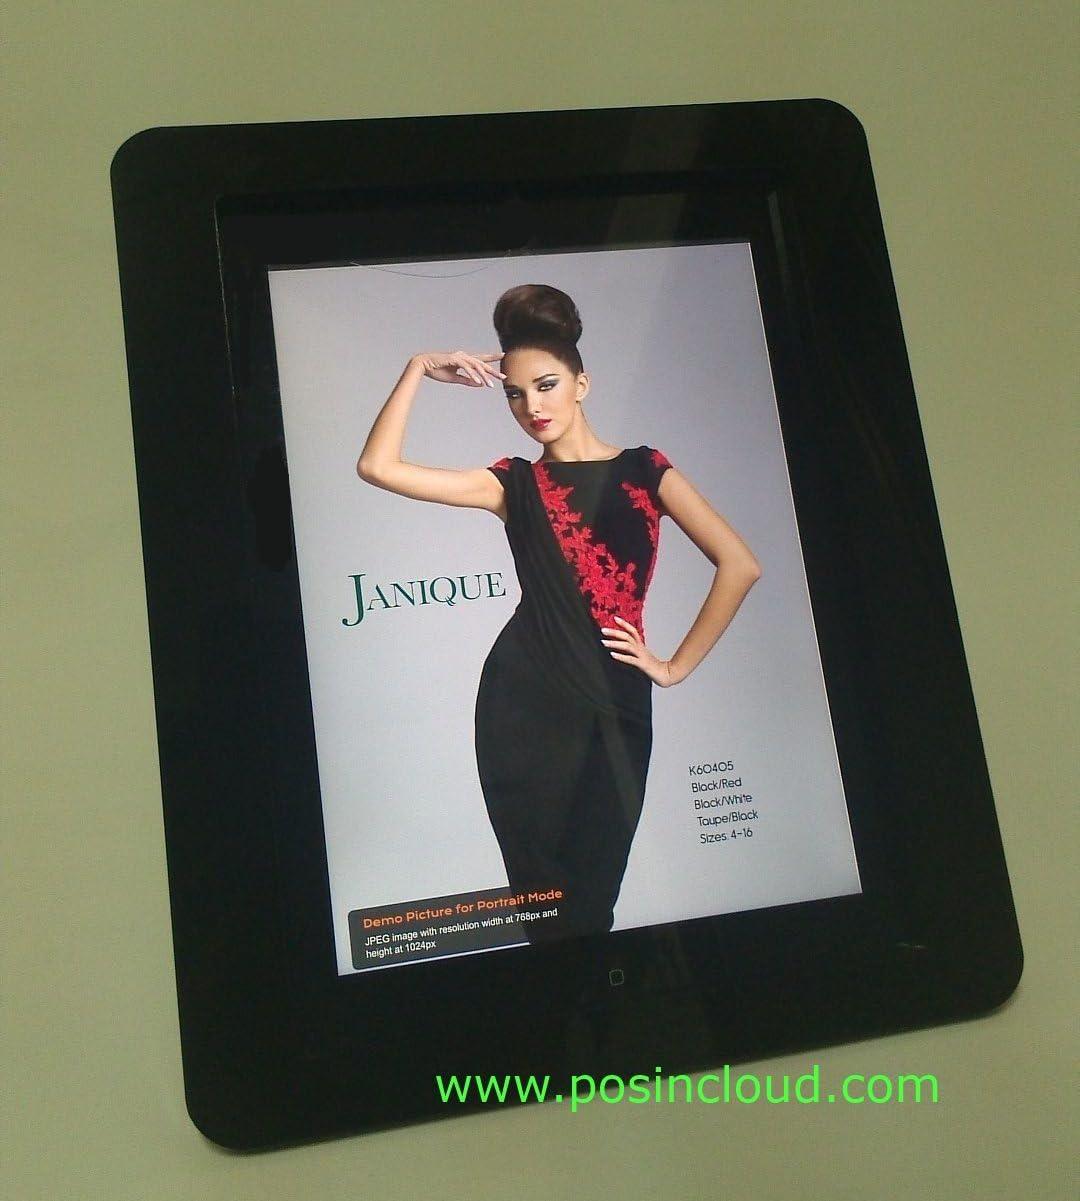 TABcare Compatible iPad Air VESA Mount Enclosure, Black Acrlyic Material for POS, Kiosk, Show Display, Store Display, Square Card Reader